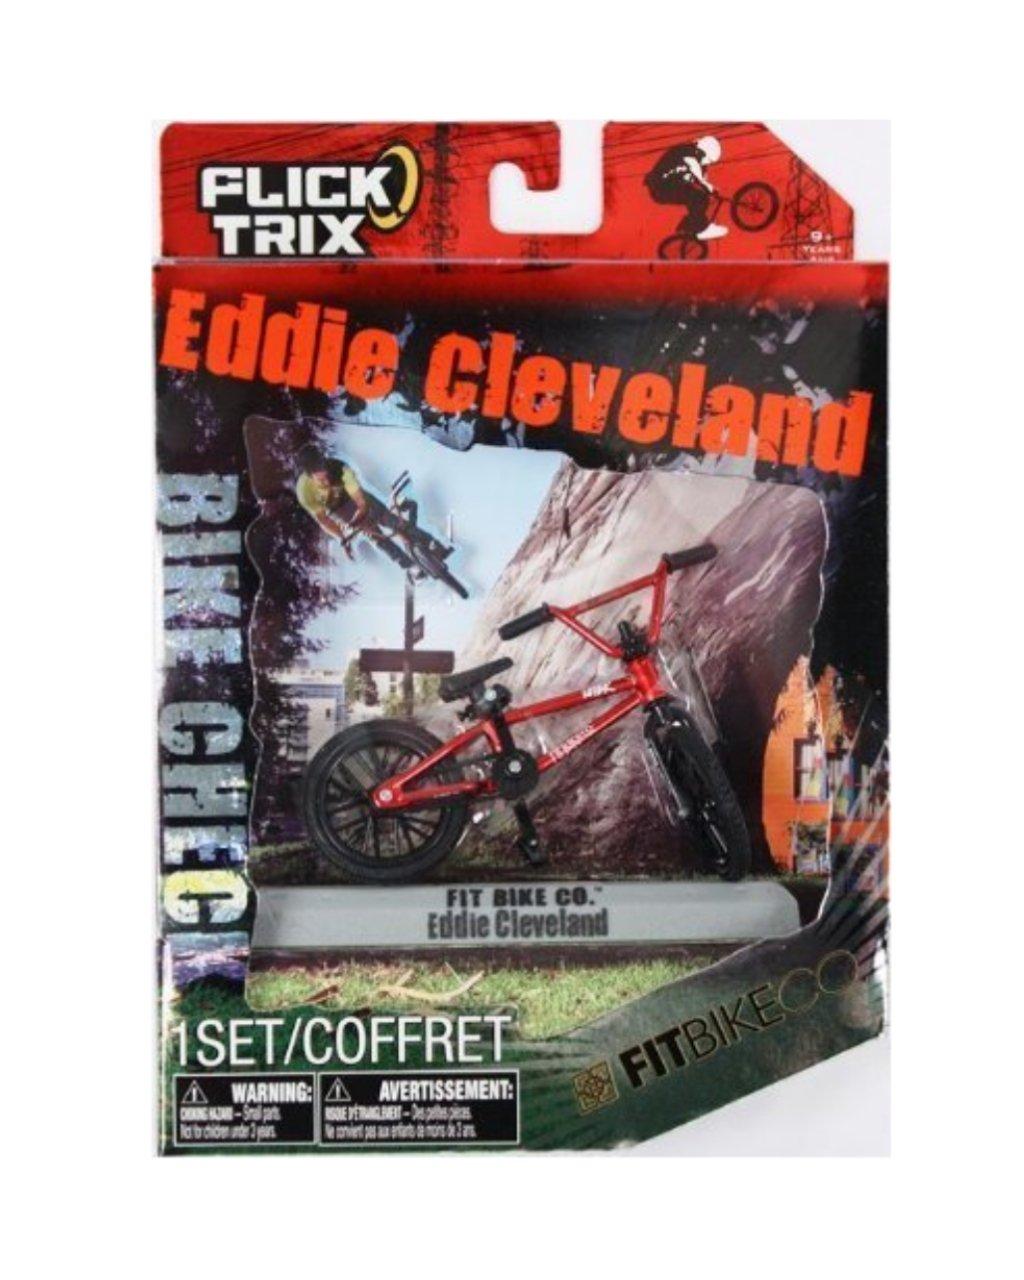 Flick Trix - Eddie Cleveland - Fit Bike Company Spin Master